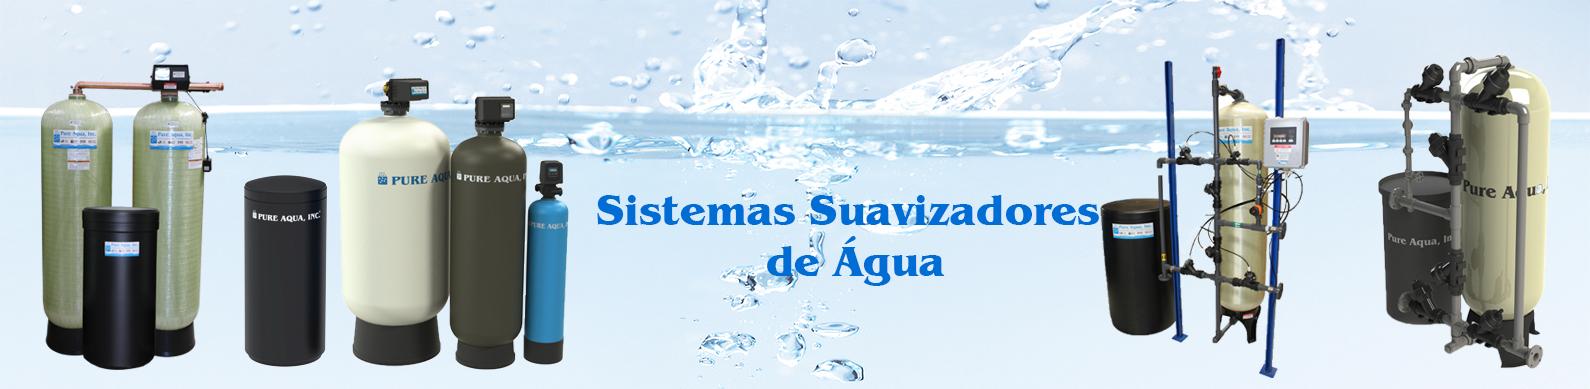 sistema-suavizadores-de-agua.jpg